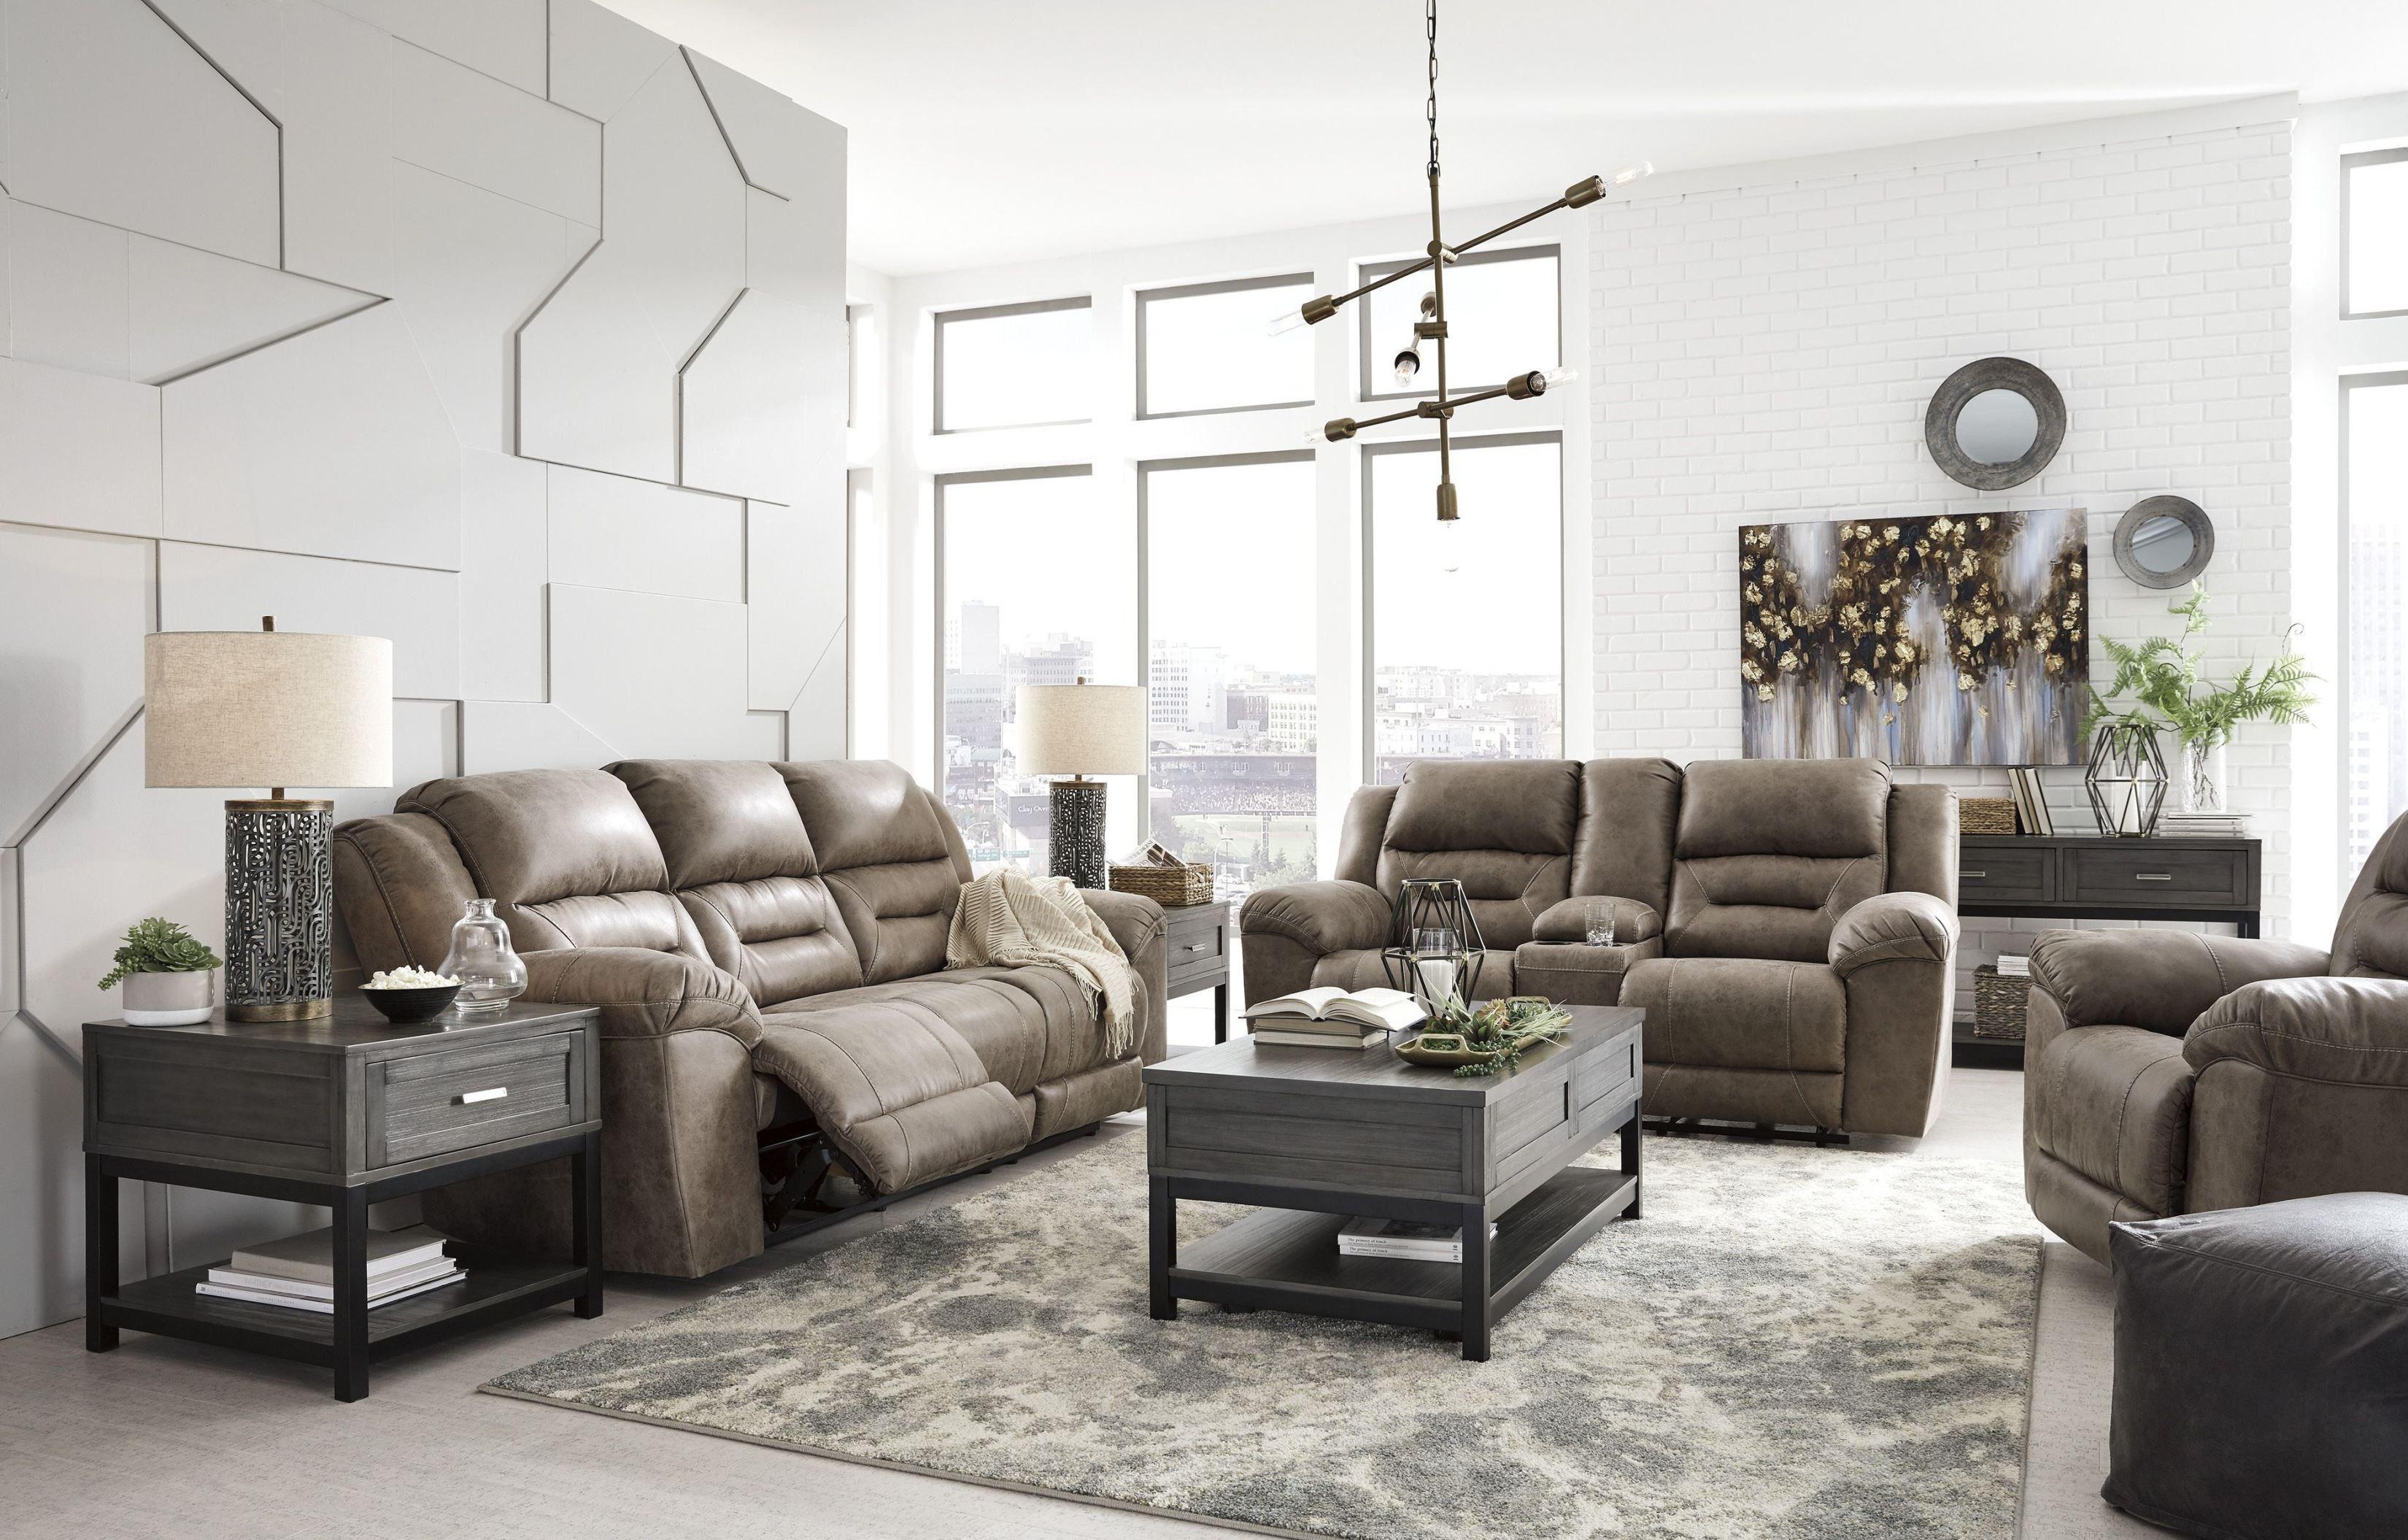 Stoneland Fossil Reclining Living Room Set In 2020 Loveseat